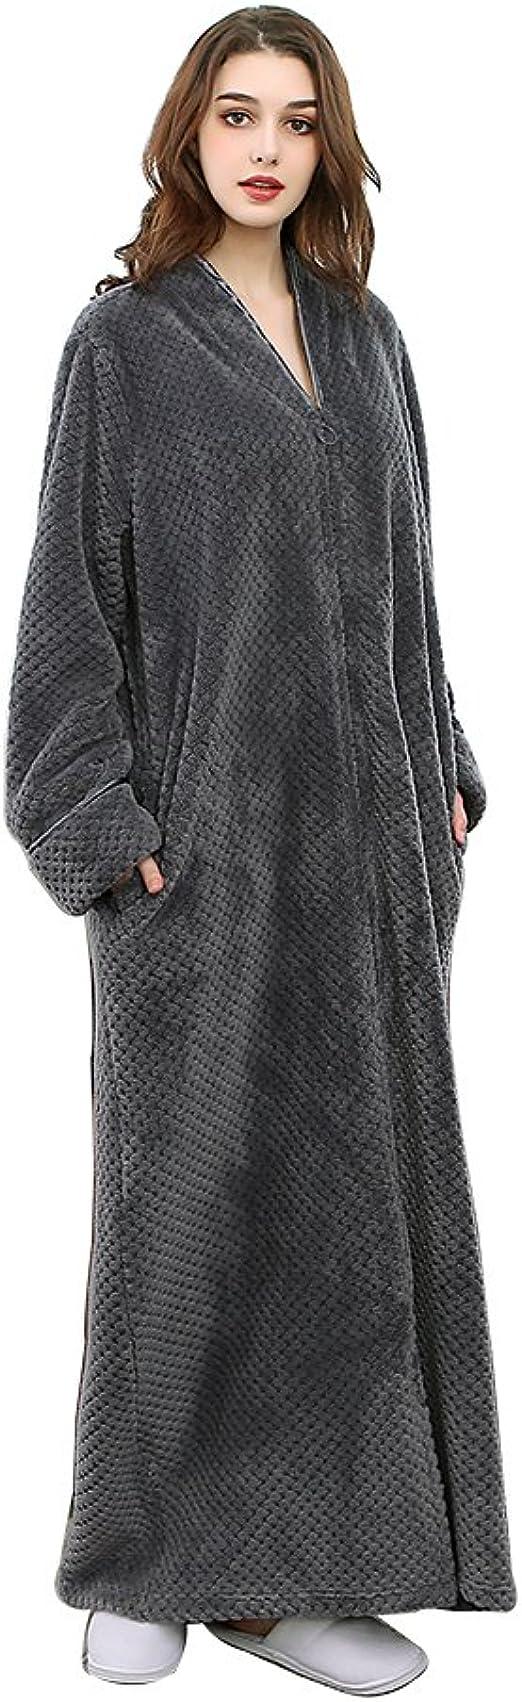 ZFSOCK Damen Morgenmantel Extra Lang Flauschig mit Kapuze Bademantel Pl/üsch Shaggy Flanell Microfaser Fleece Winter Cozy Warm Weich Bodenlang Loungewear